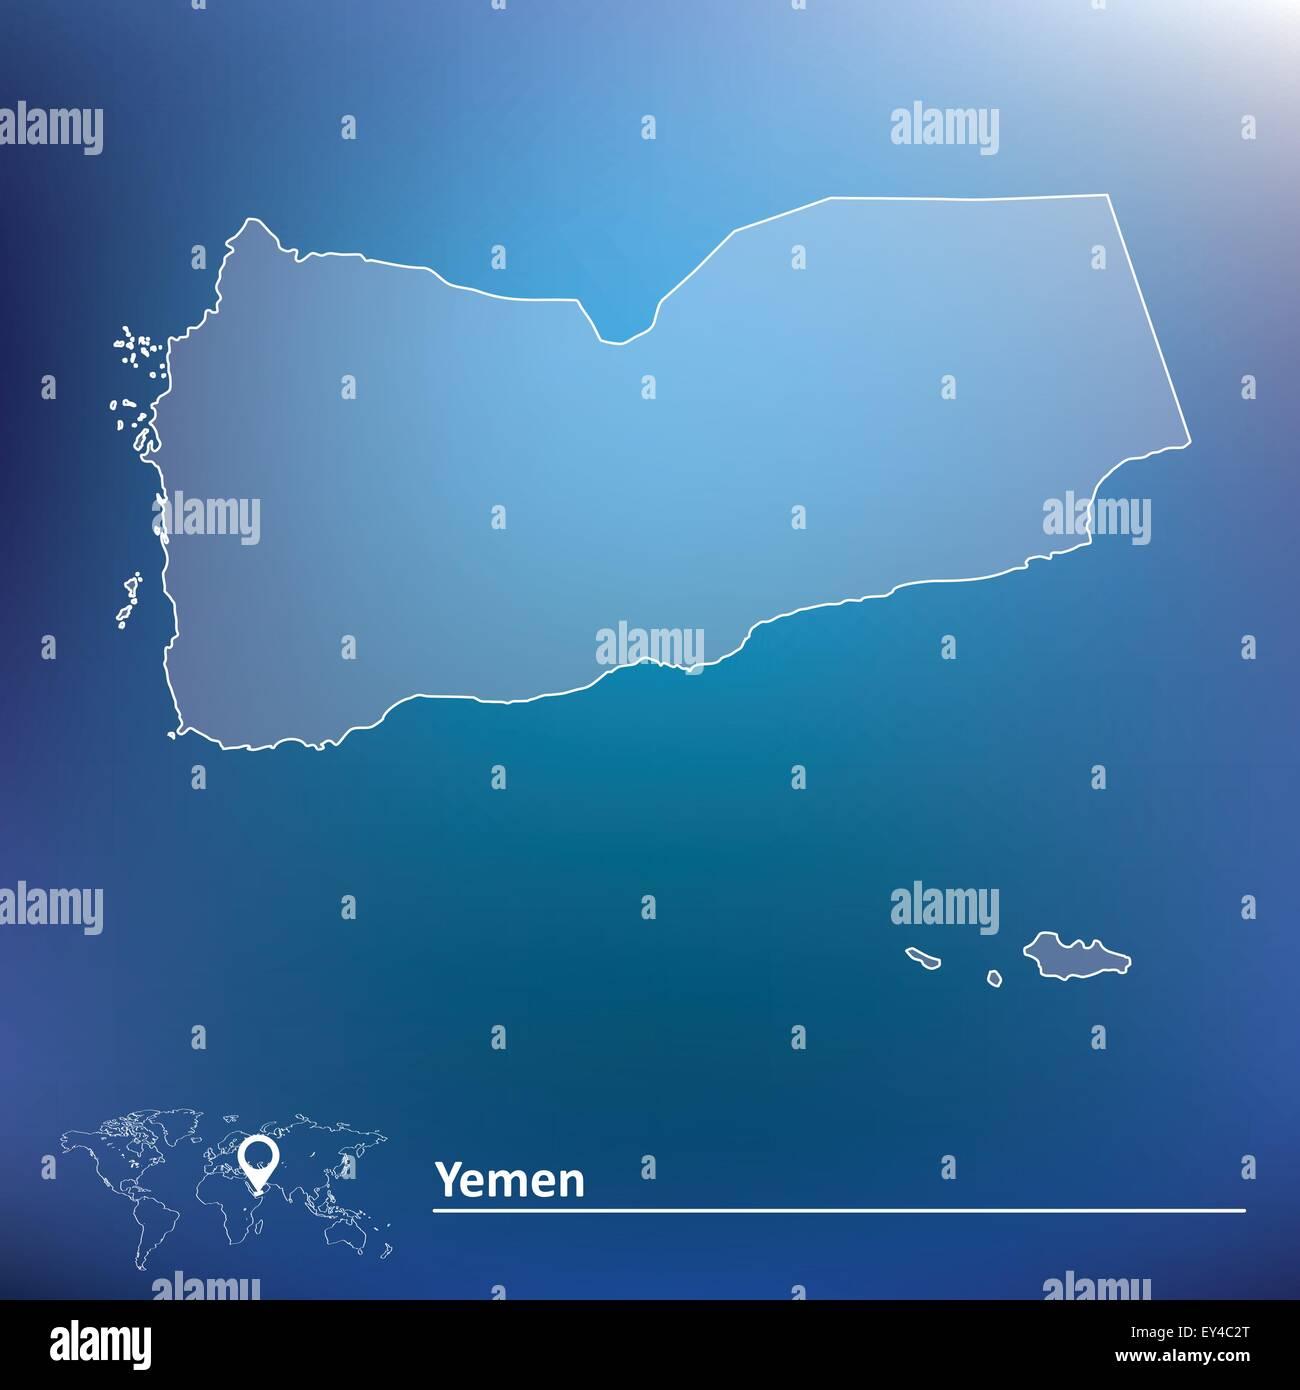 Map of Yemen - vector illustration - Stock Vector